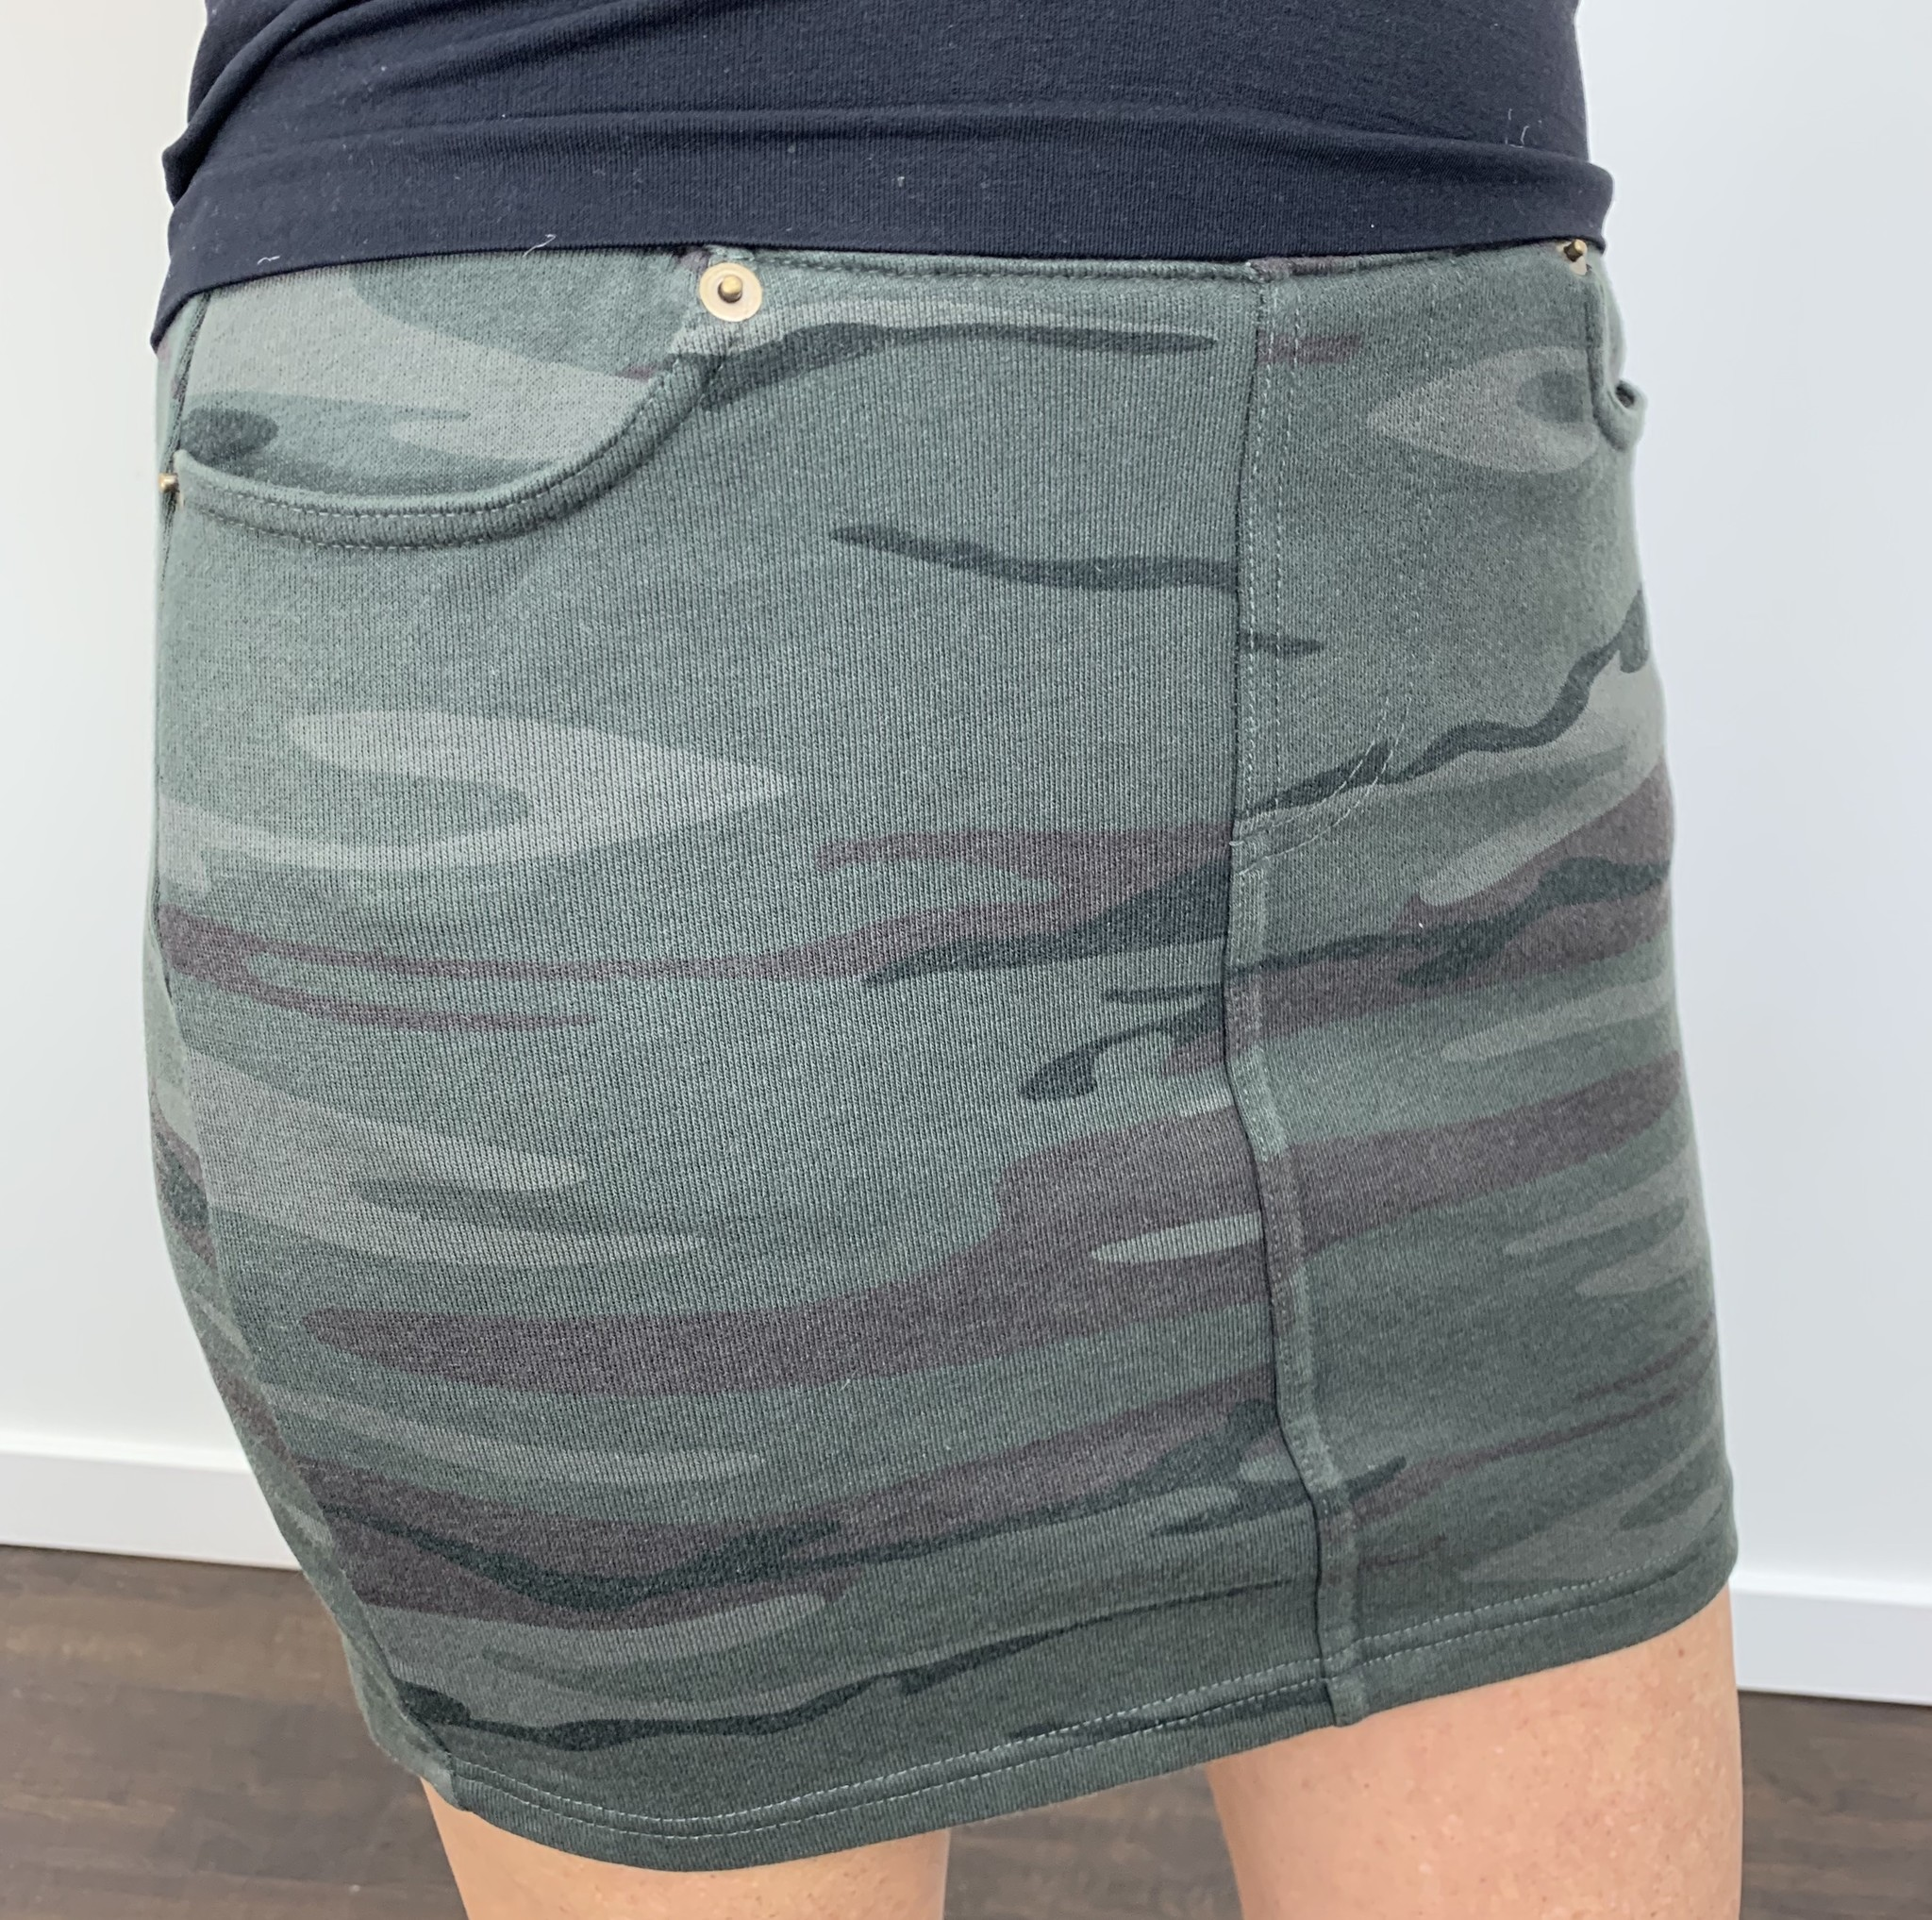 ZSupply The Camo Knit Mini Skirt